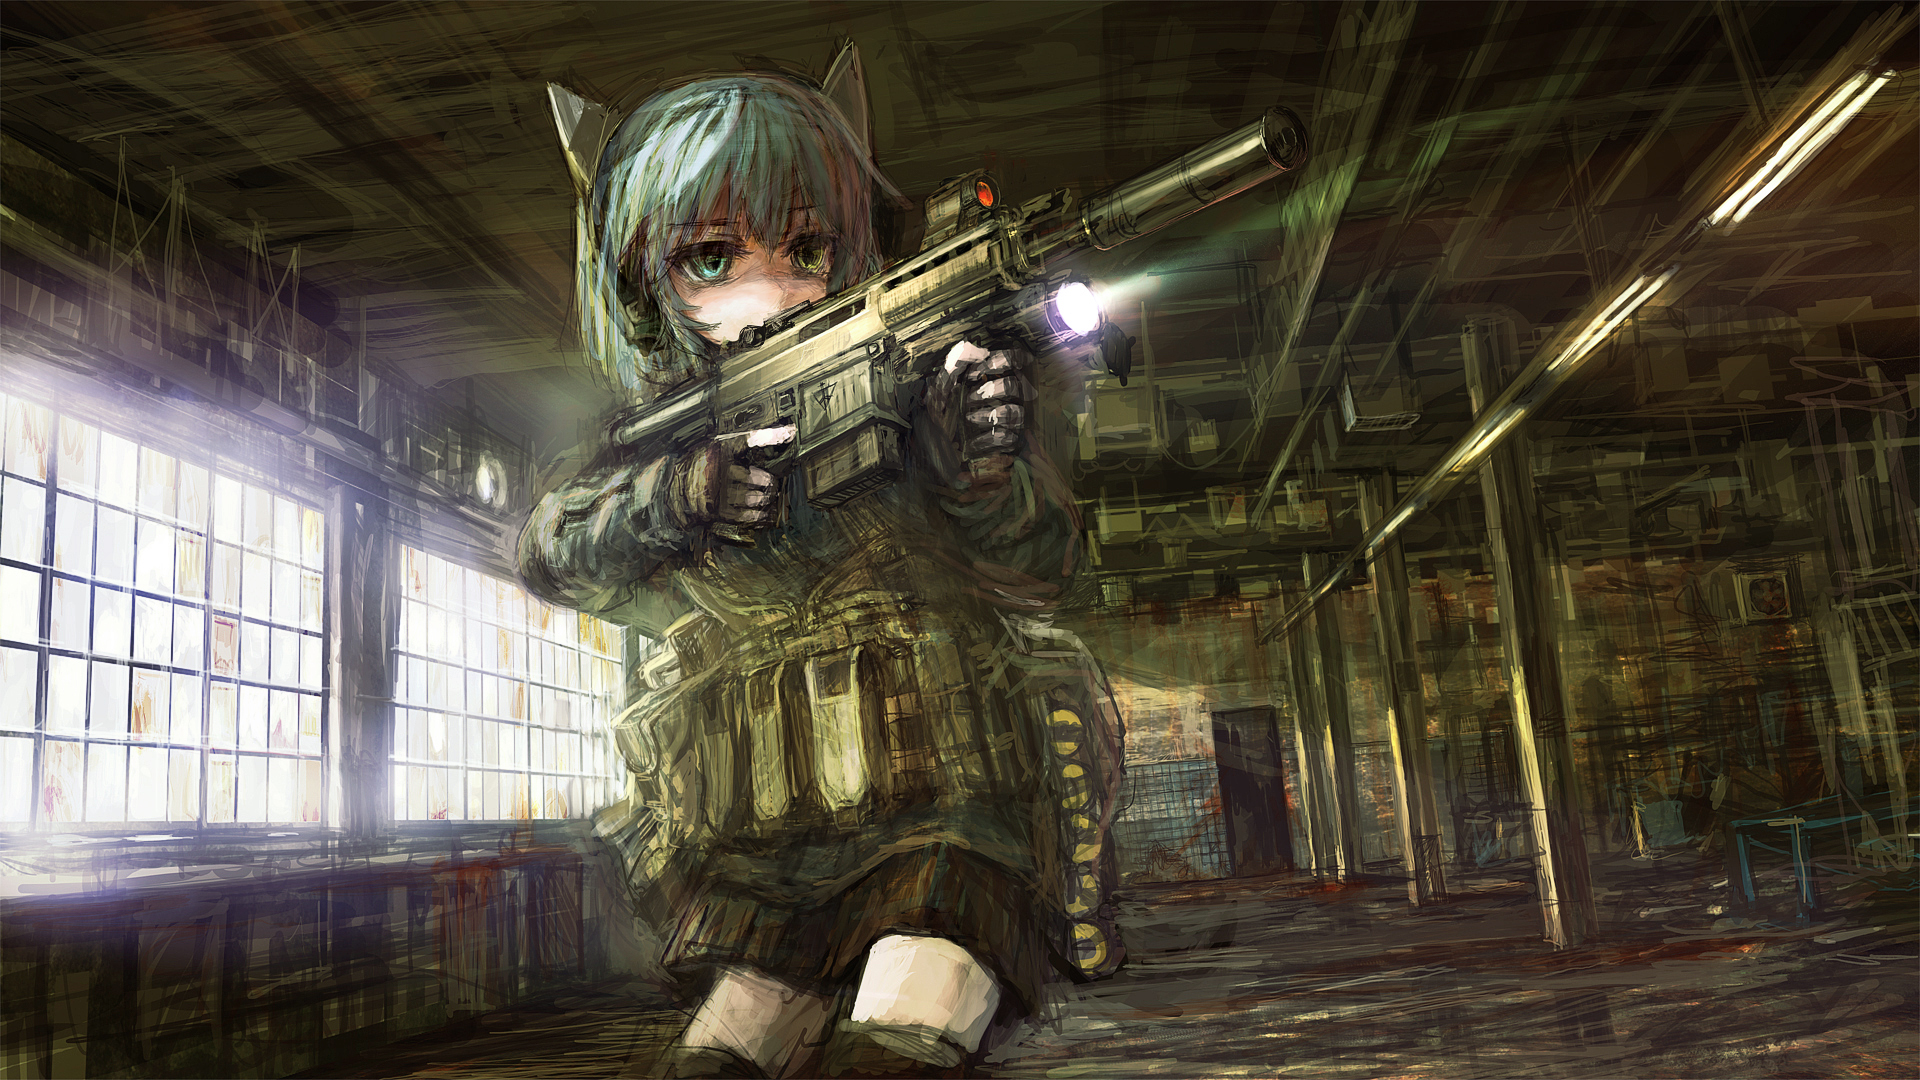 Anime Girl With Gun wallpaper | anime and game art | Pinterest